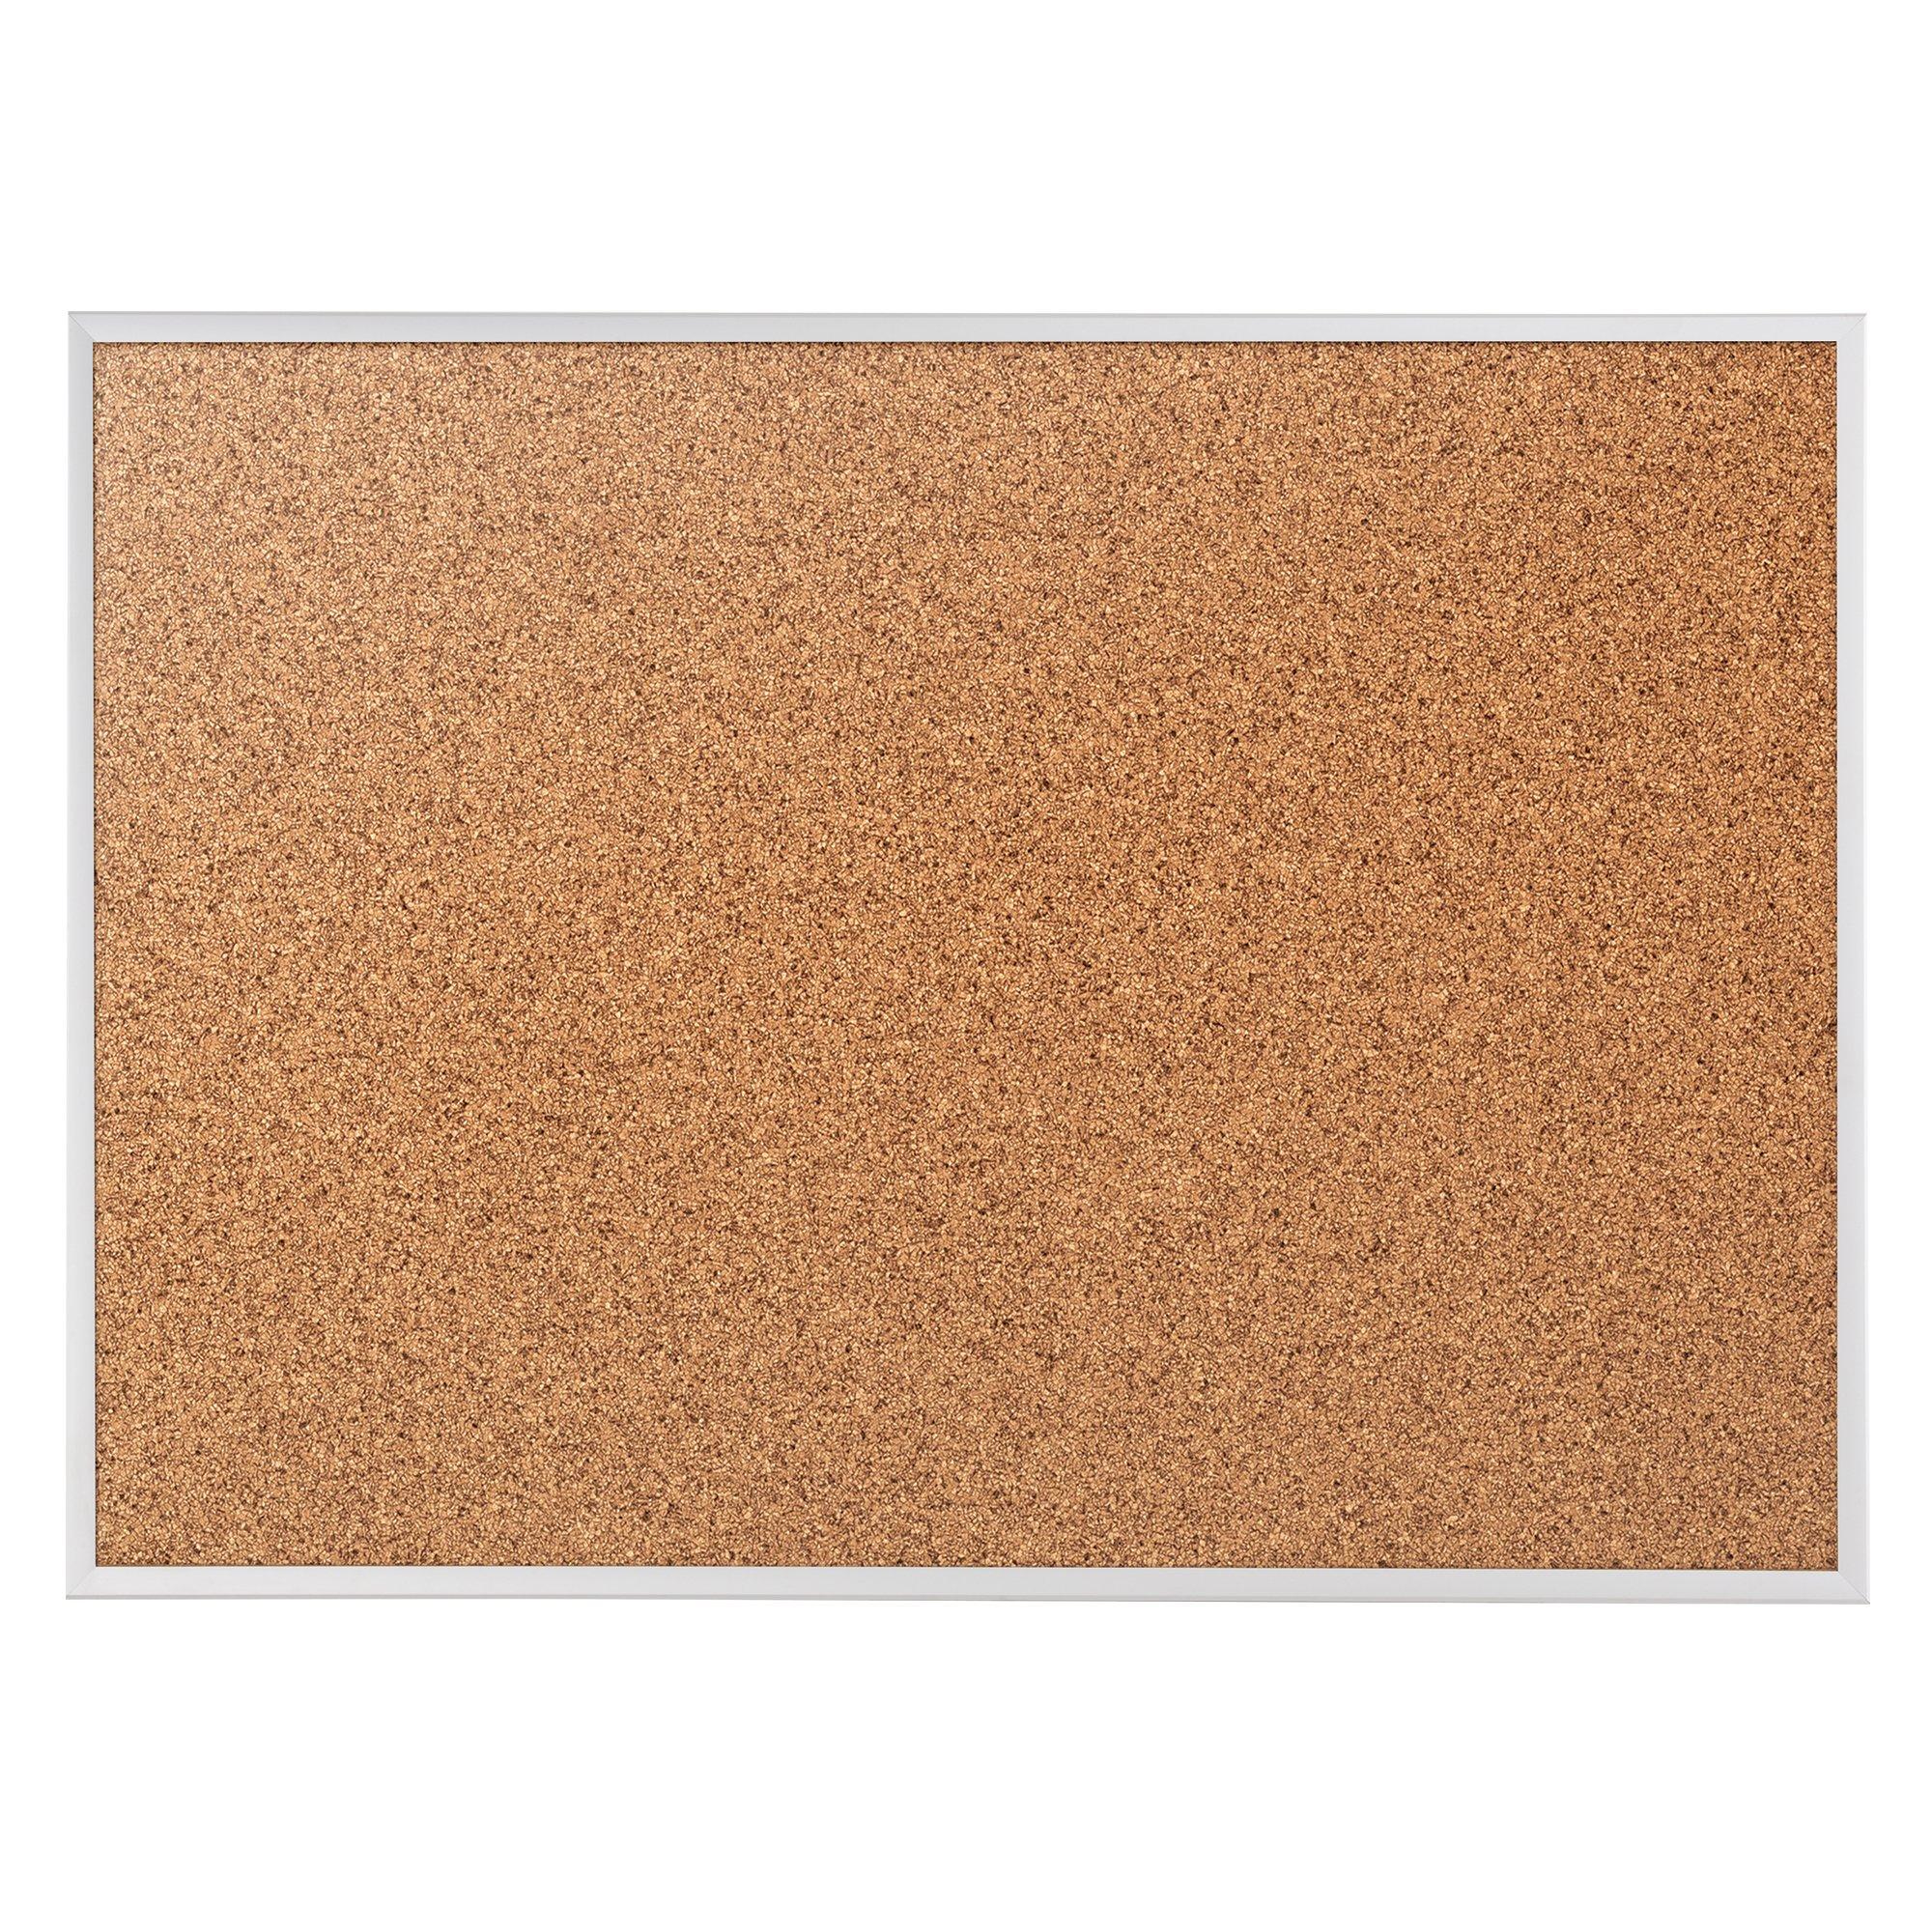 Quartet Cork Bulletin Board, Cork Board, 6' x 4', Aluminum Frame (2307)